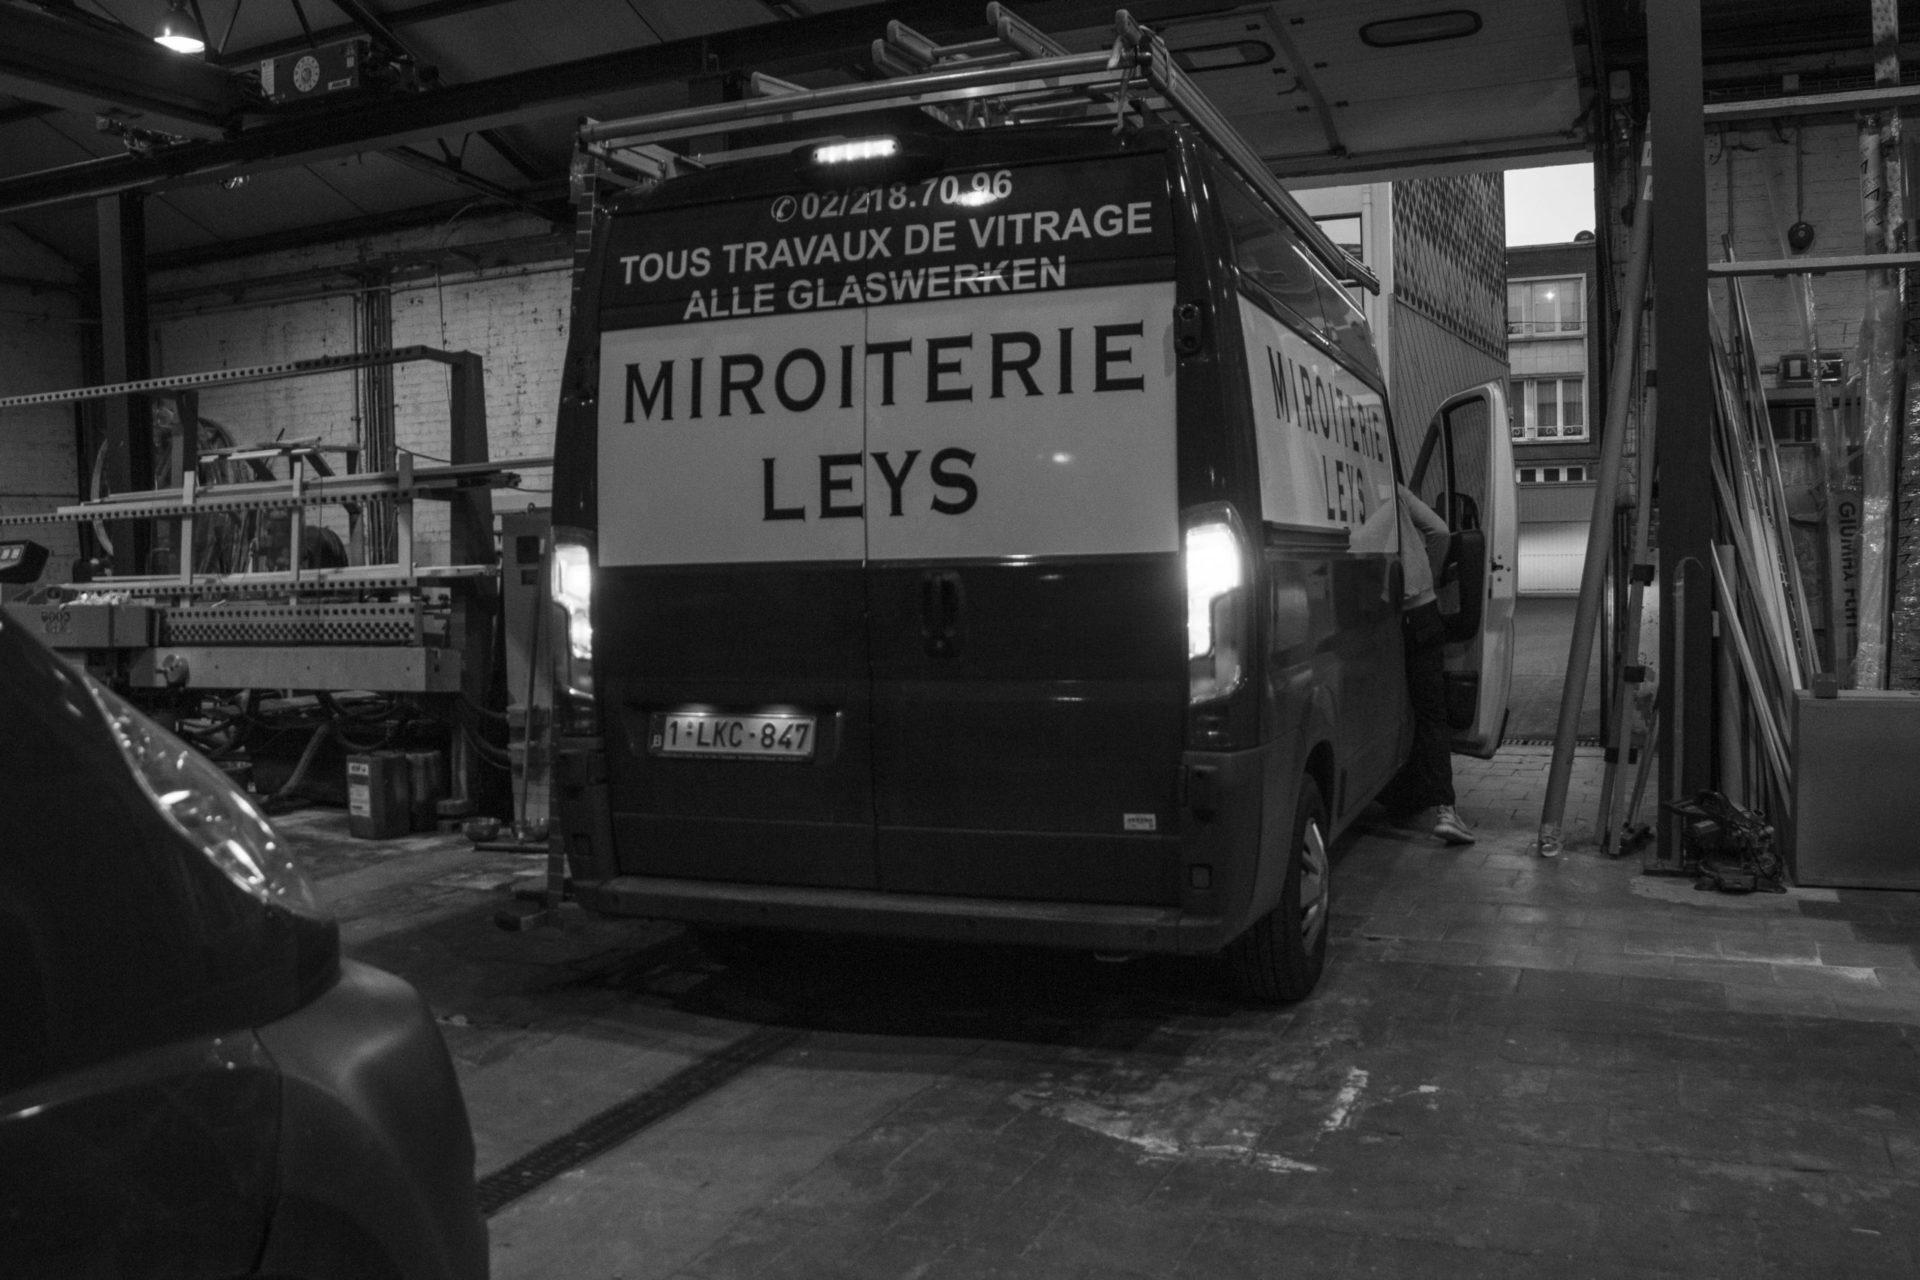 Miroiterie Leys and Fils - notre équipe